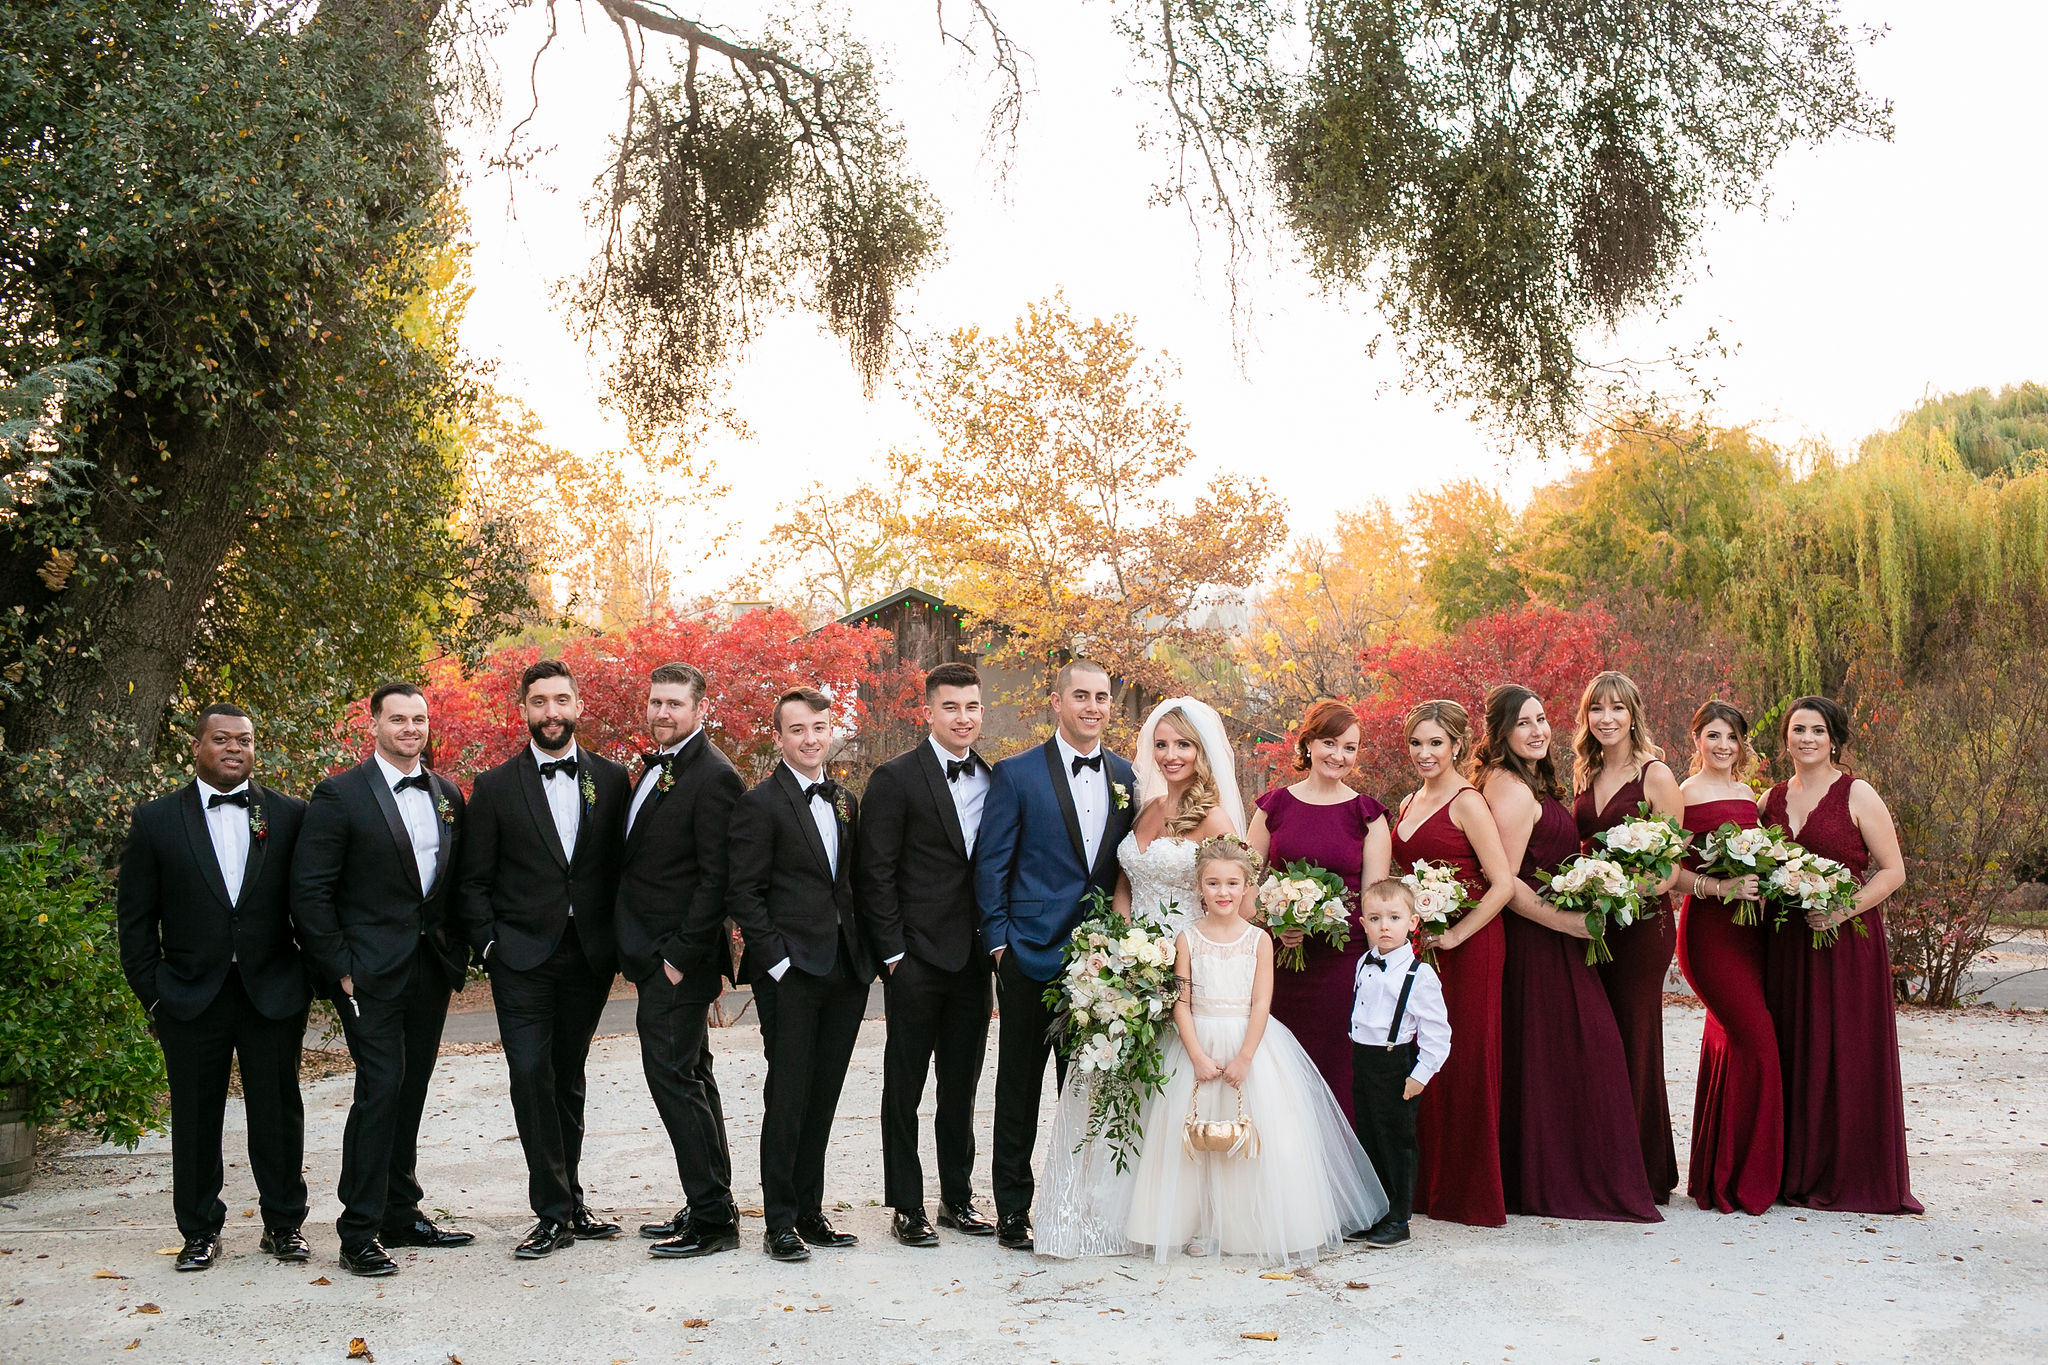 union hill inn sonora wedding-26.jpg